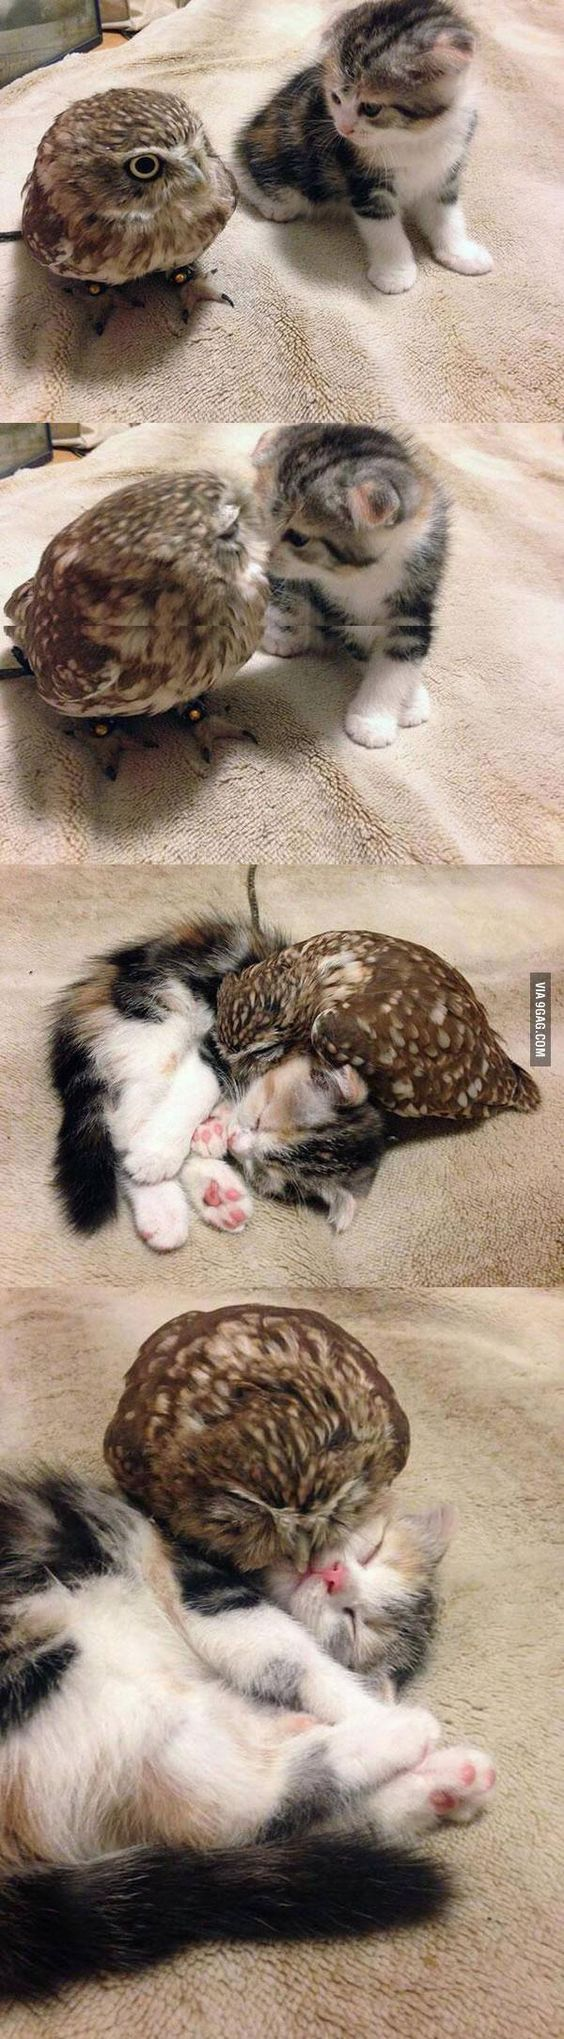 Tiny owl and tiny kitten - www.viralpx.com | www.facebook.com/viralpx: